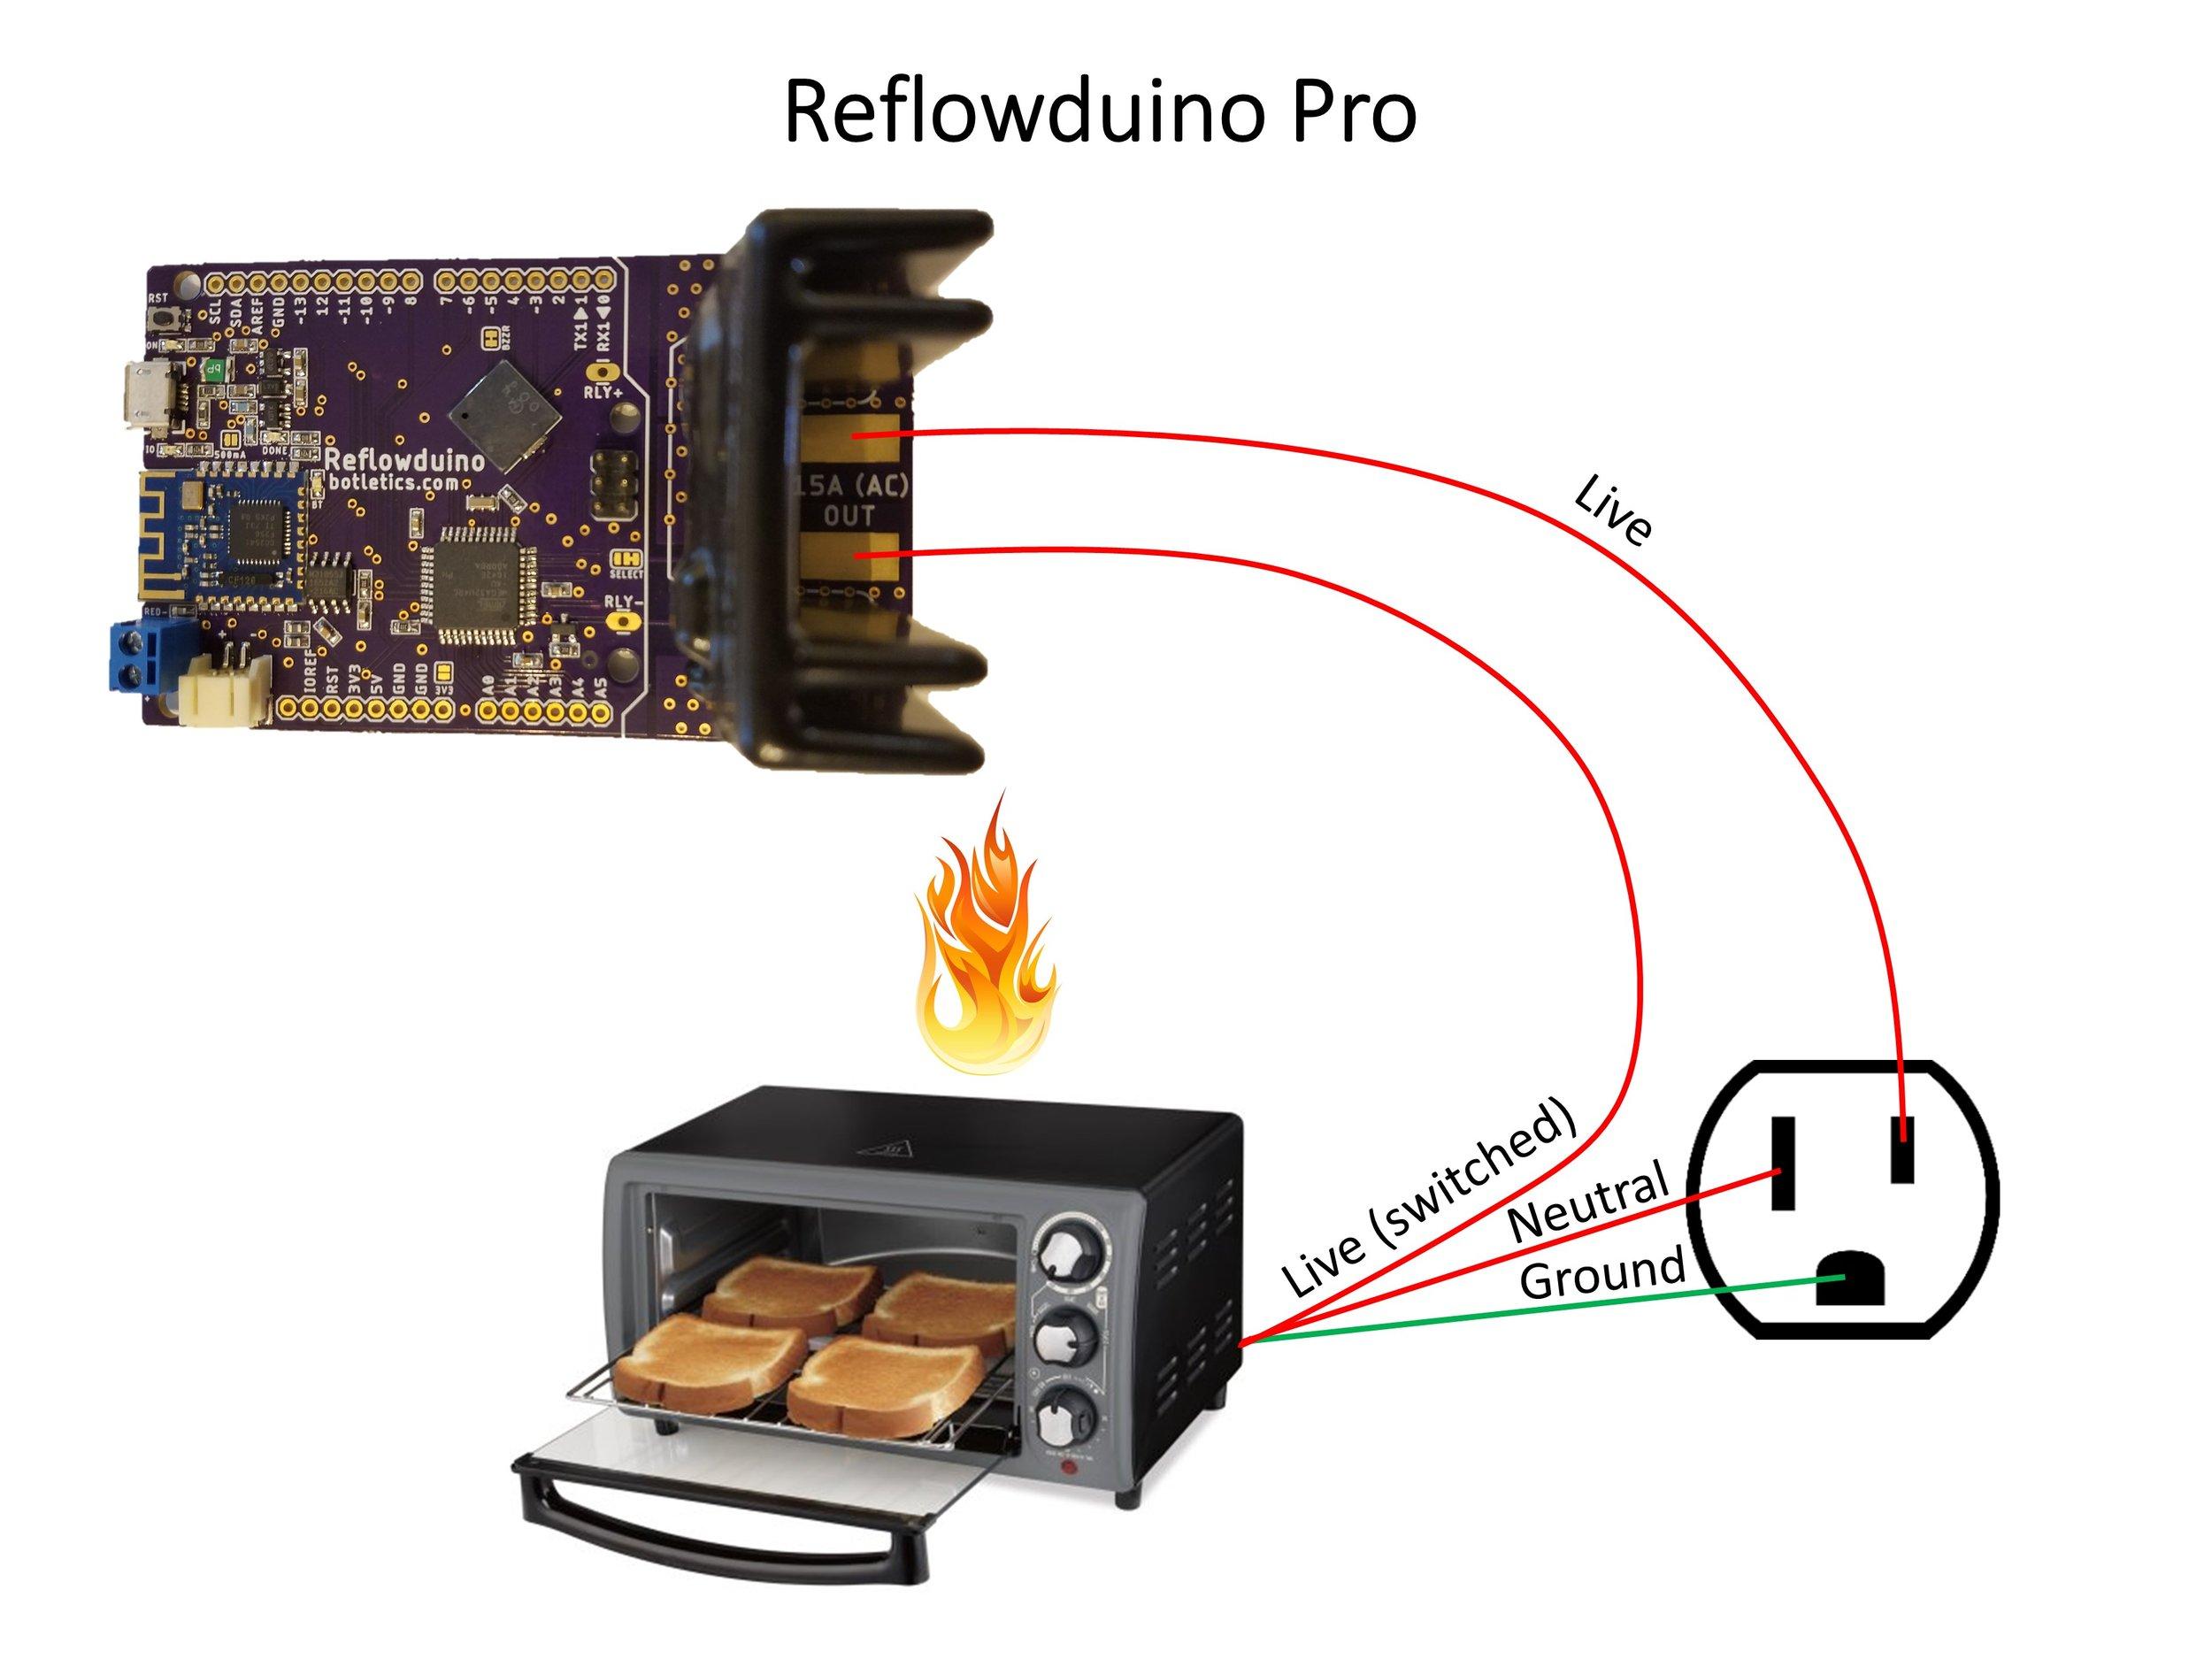 Reflowduino Pro Wiring Diagram